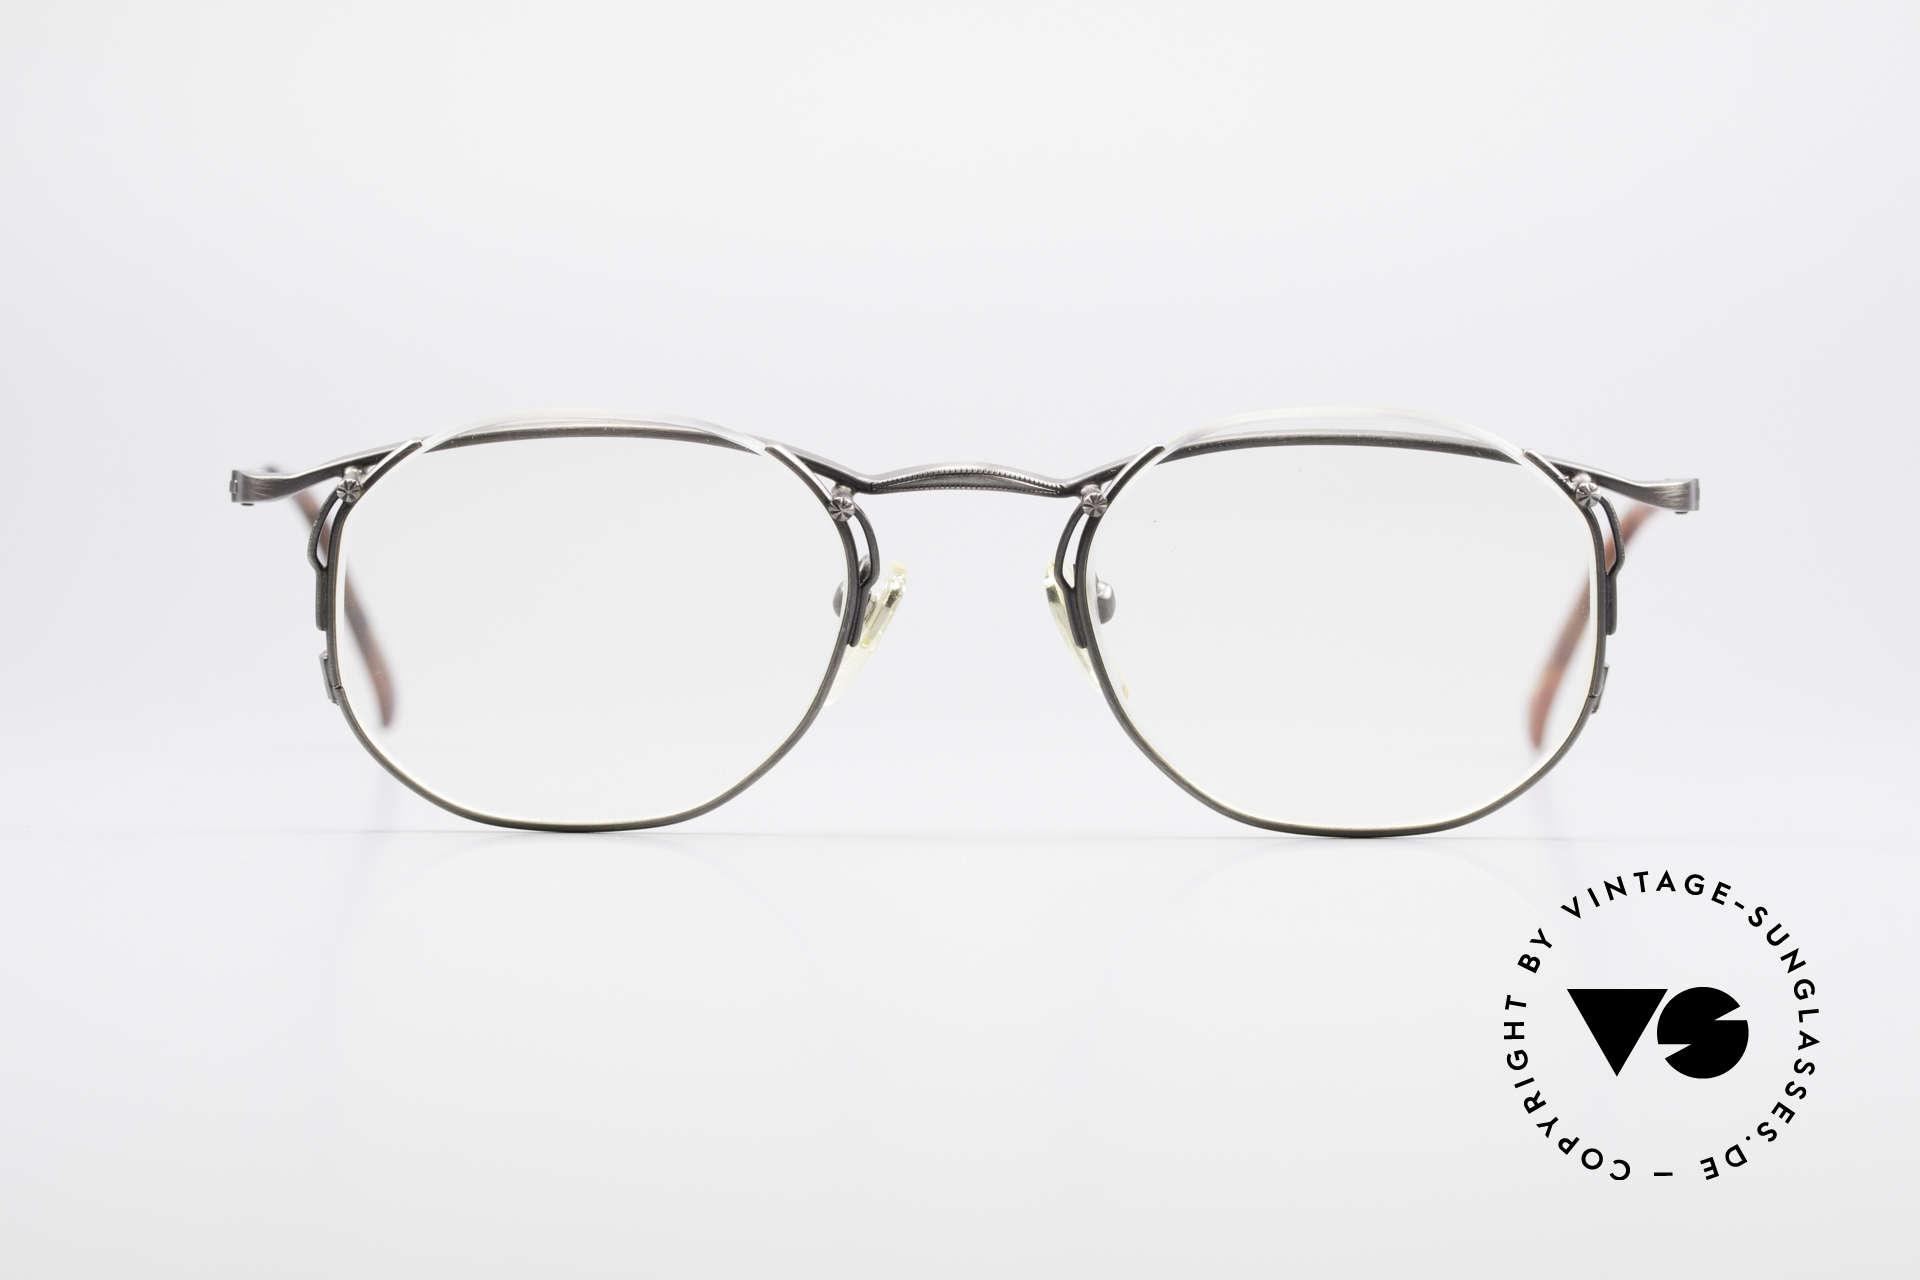 Matsuda 2856 Extraordinary Vintage Frame, extraordinary frame construction; truly UNIQUE!, Made for Men and Women